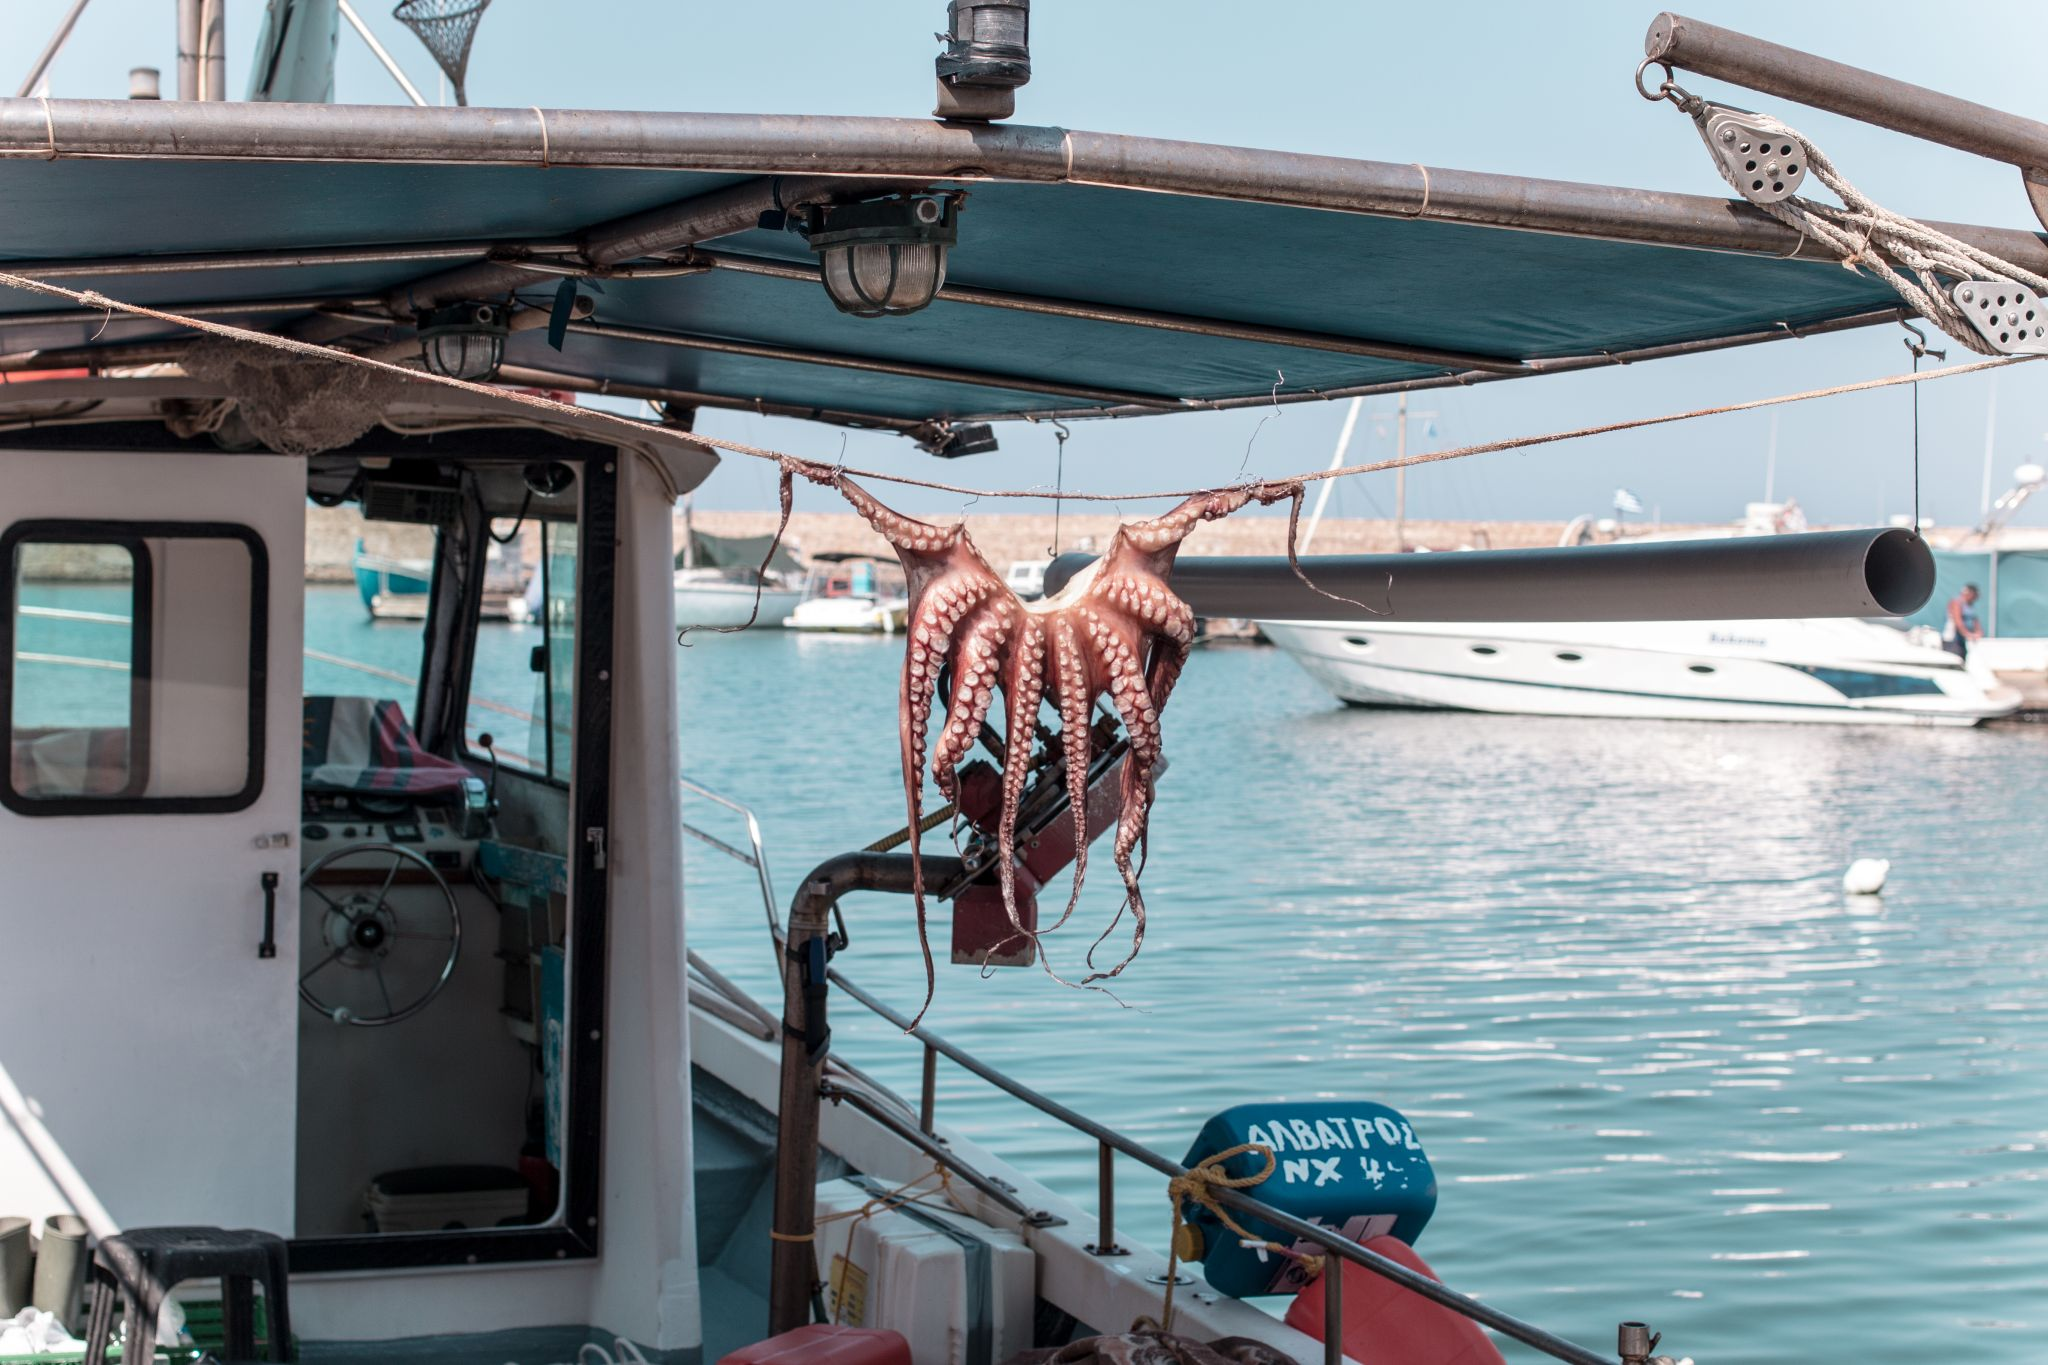 Crete Travel Guide Chania Octopus